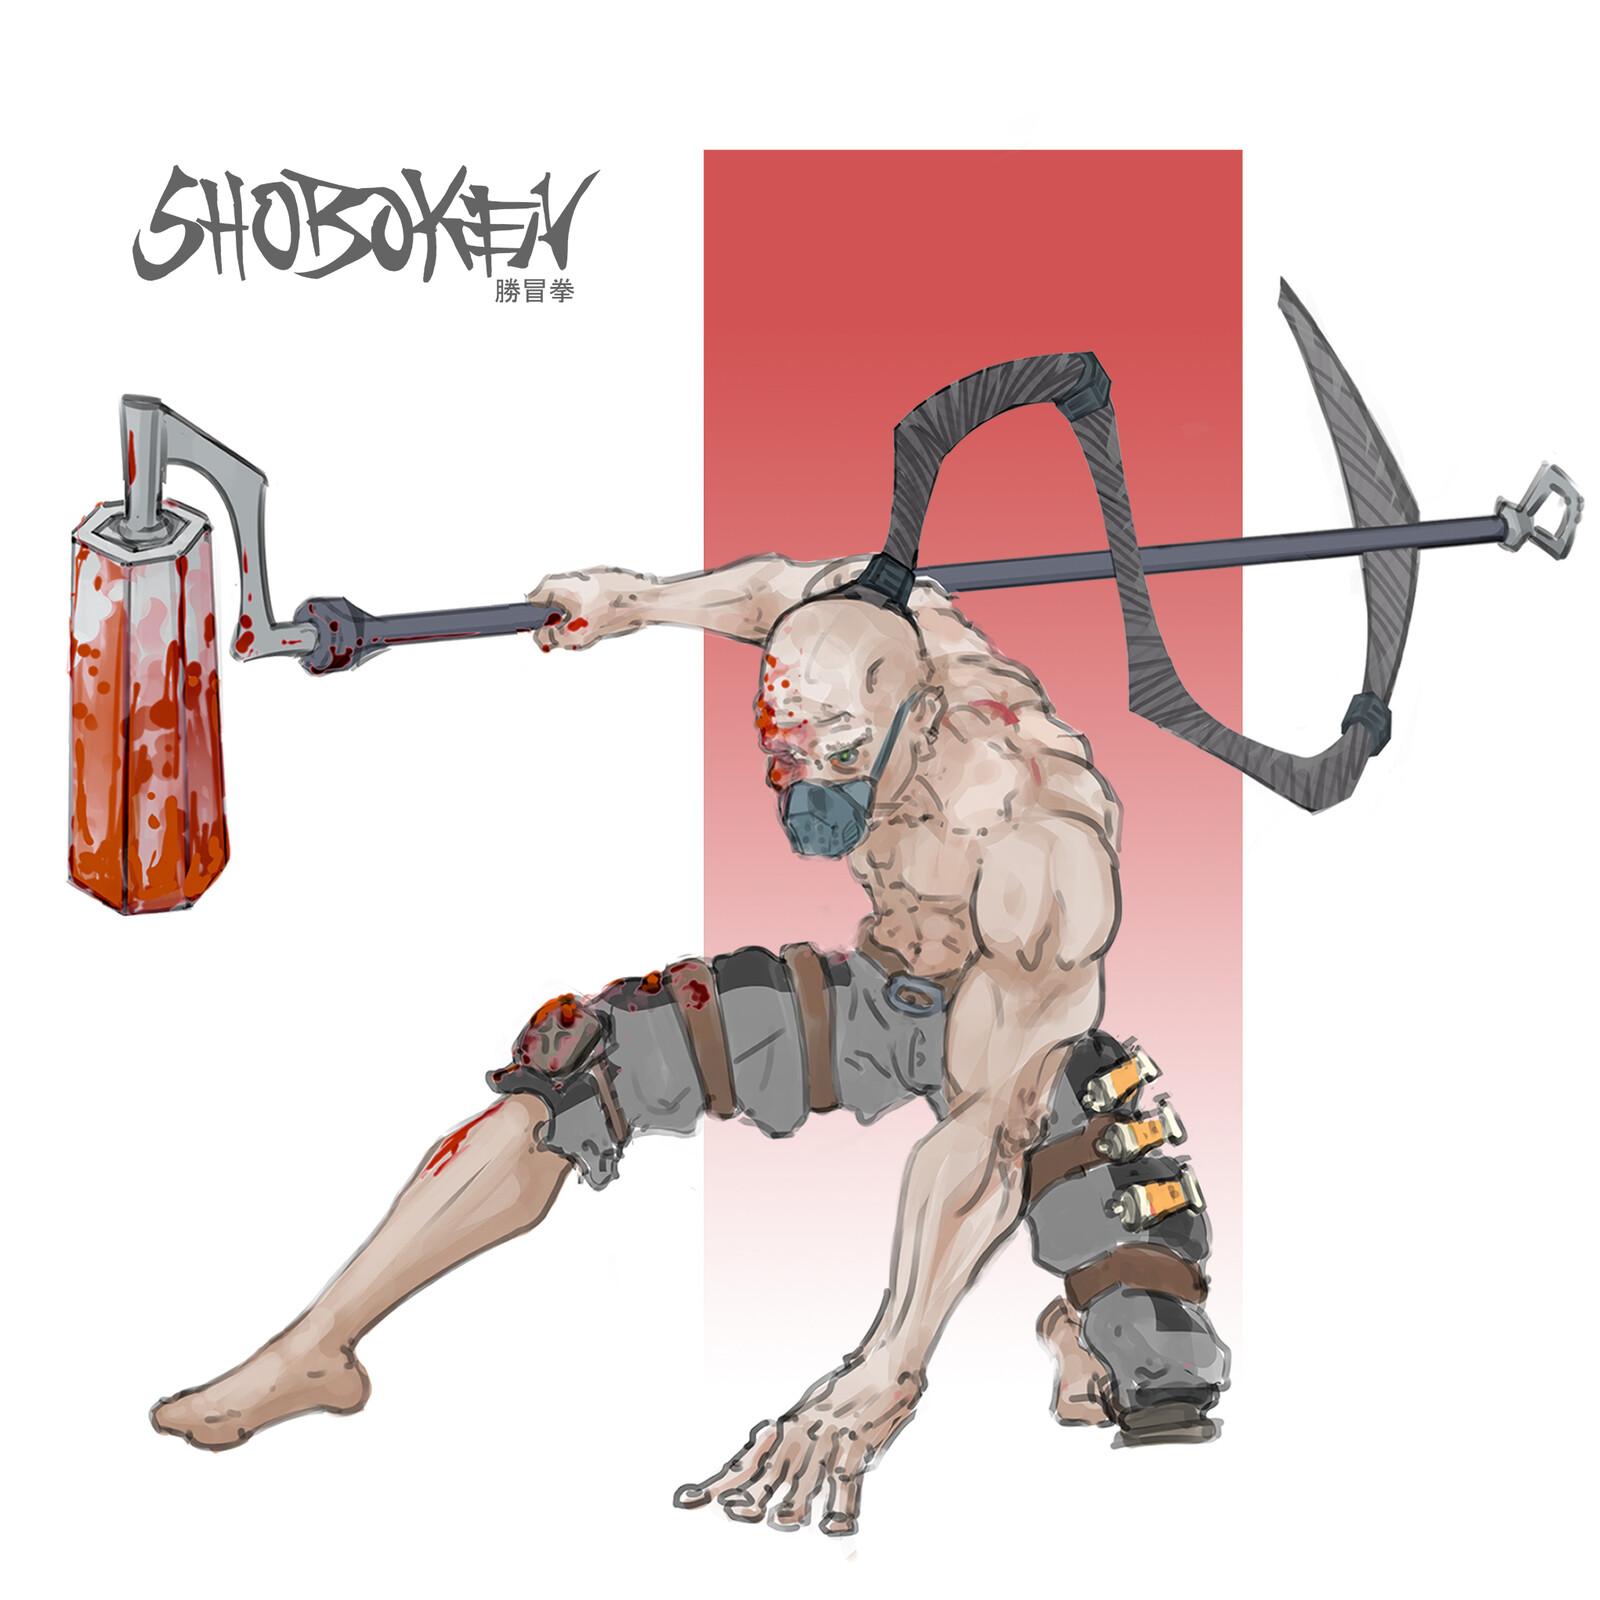 Sho - The Chosen Exile |  Character Concept